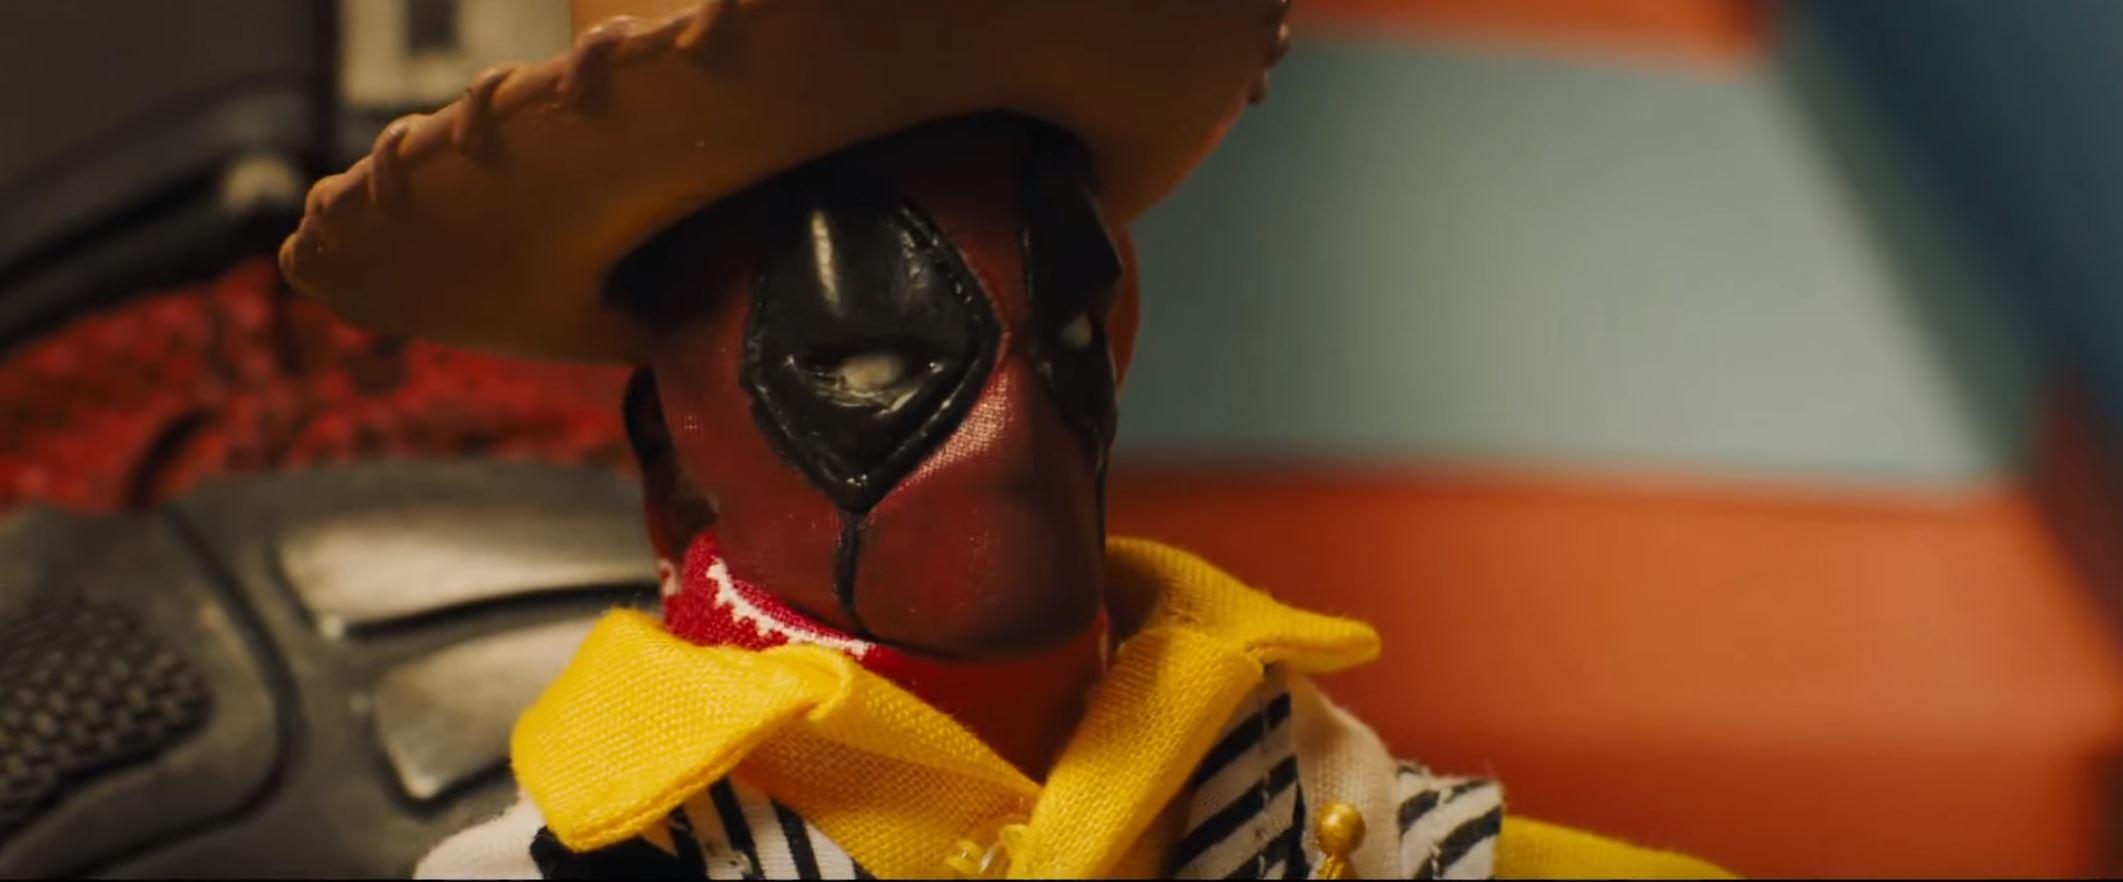 Deadpool 2 Teaser Trailer 'Meet Cable' Is Here